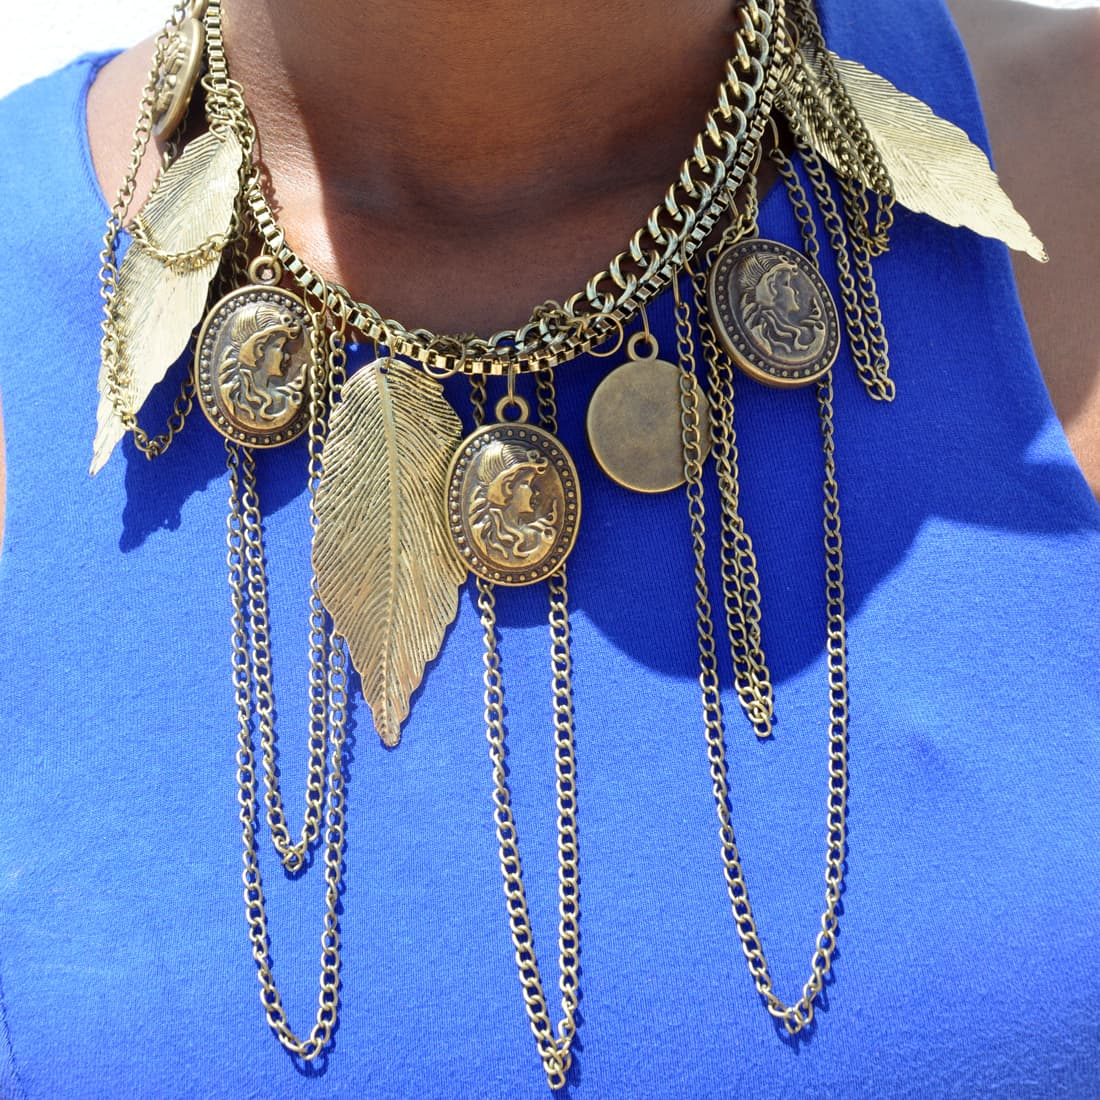 M0349 antique5 Jewelry Accessories Necklaces Chokers maureens.com boutique